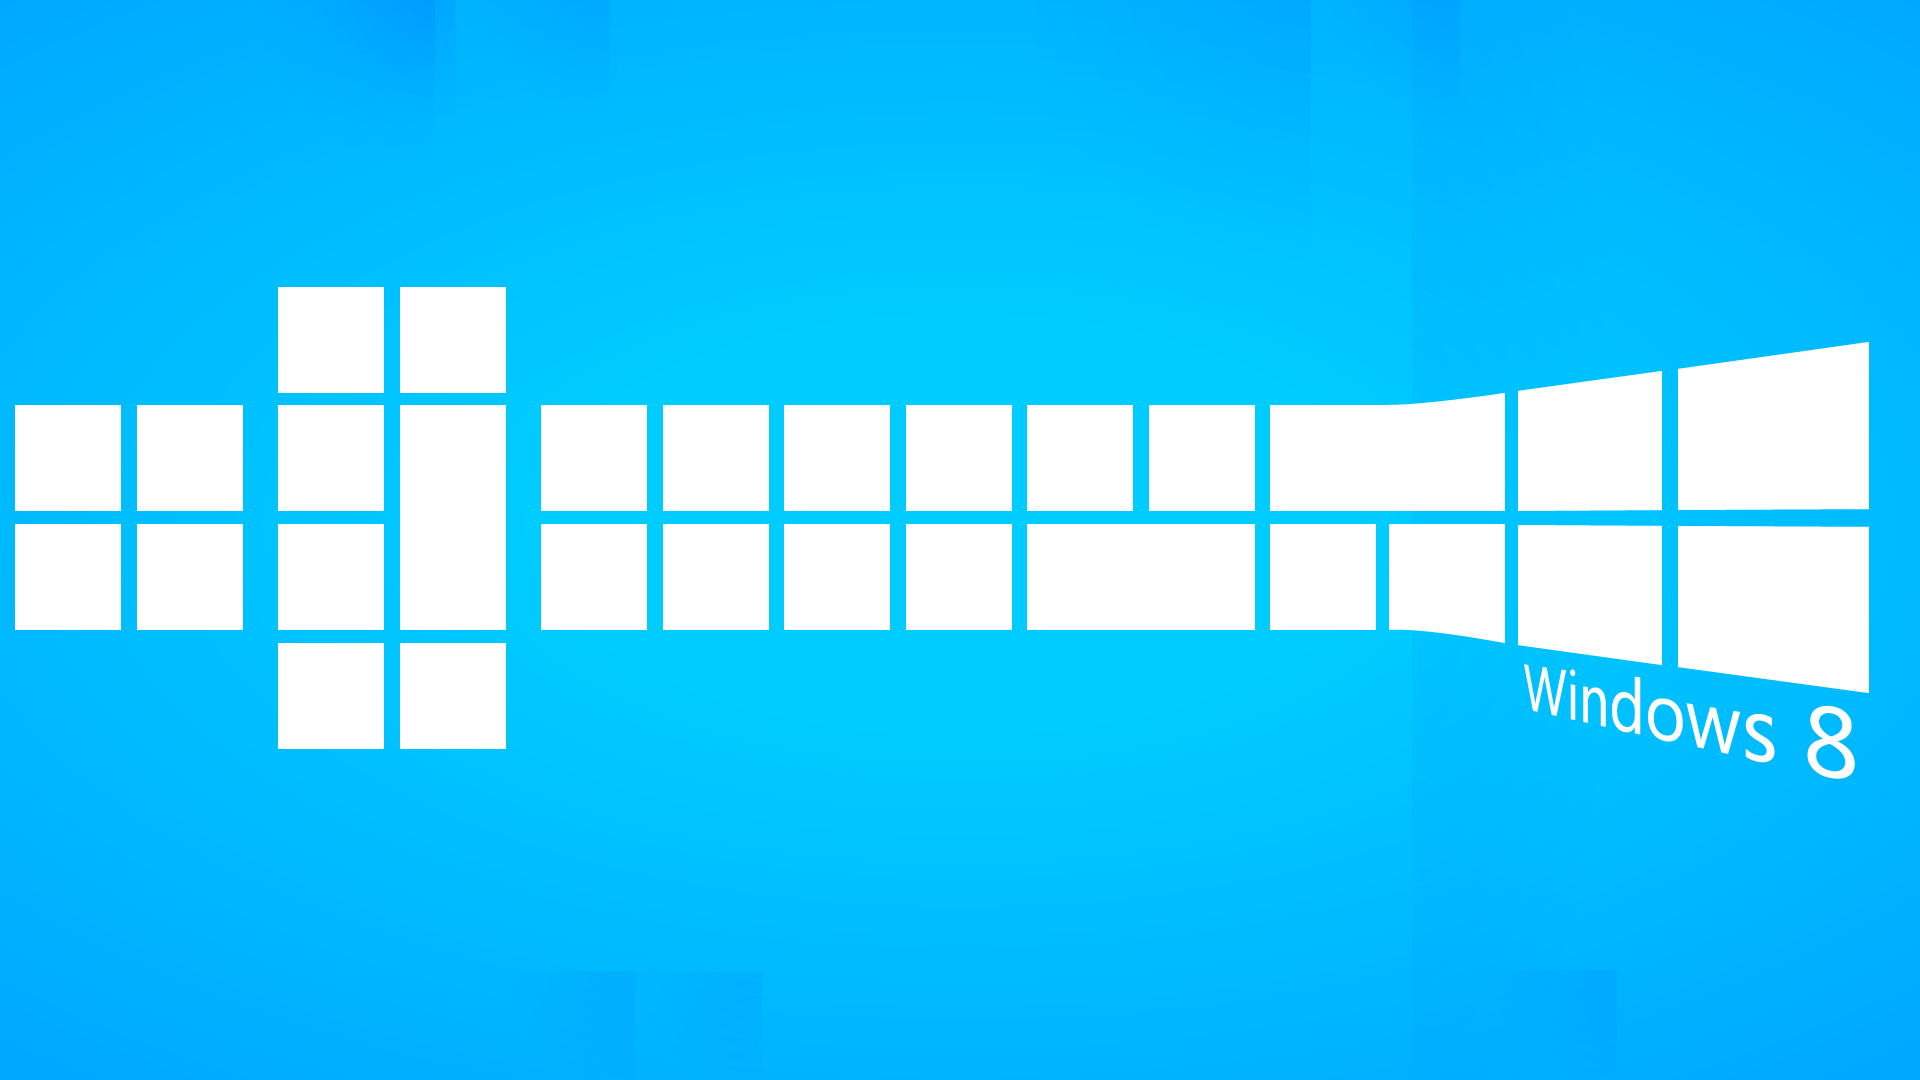 Windows8wallpaper16